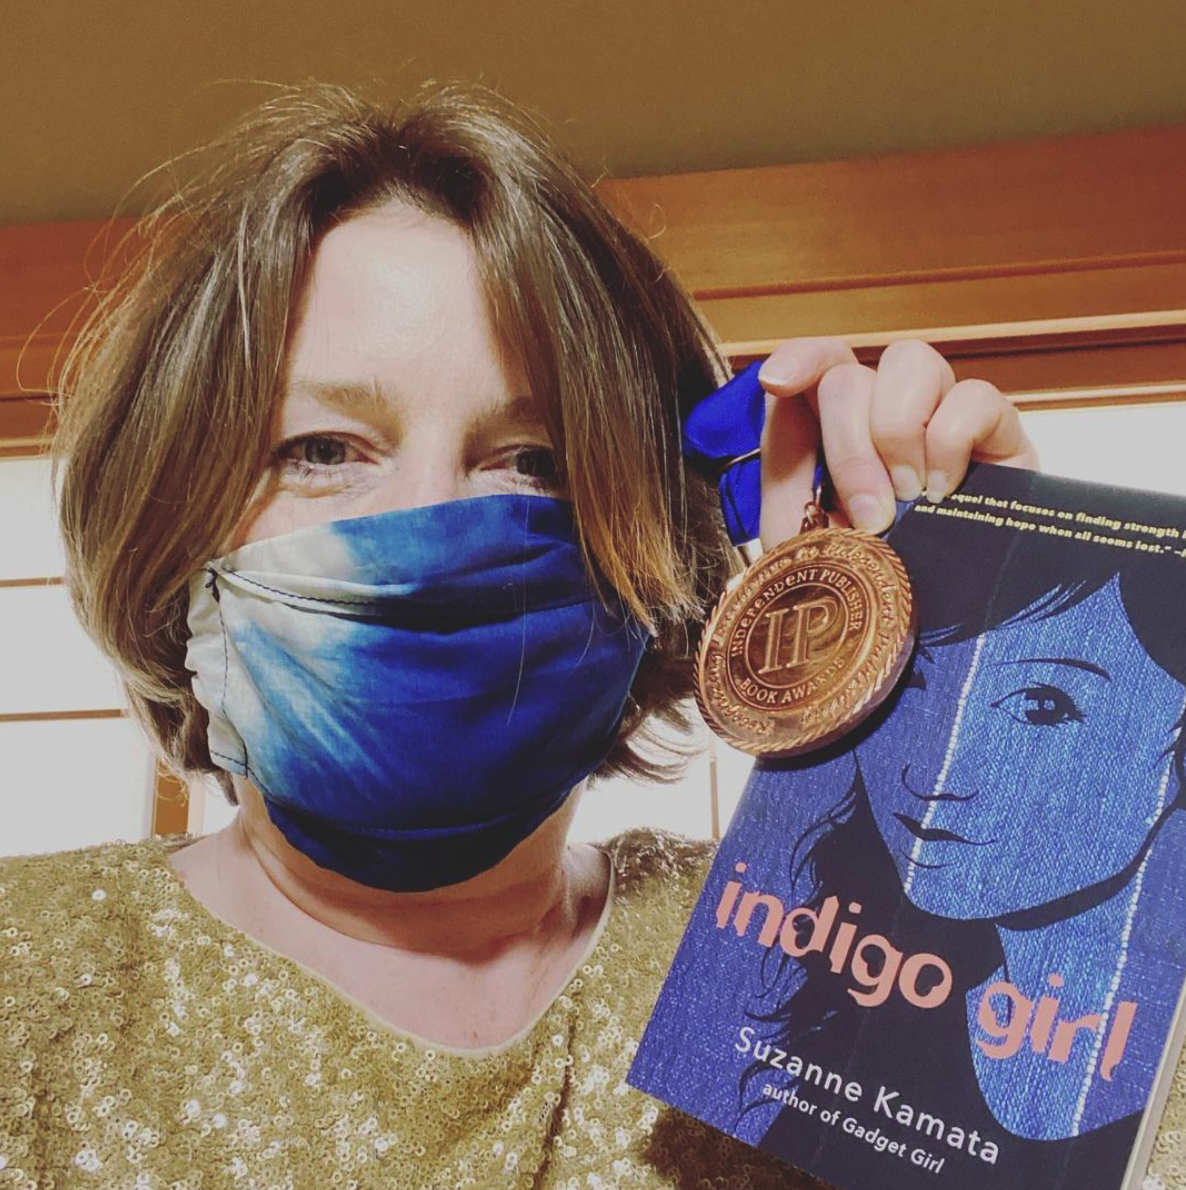 Indigo Girl, Suzanne Kamata, Adult literacy tools